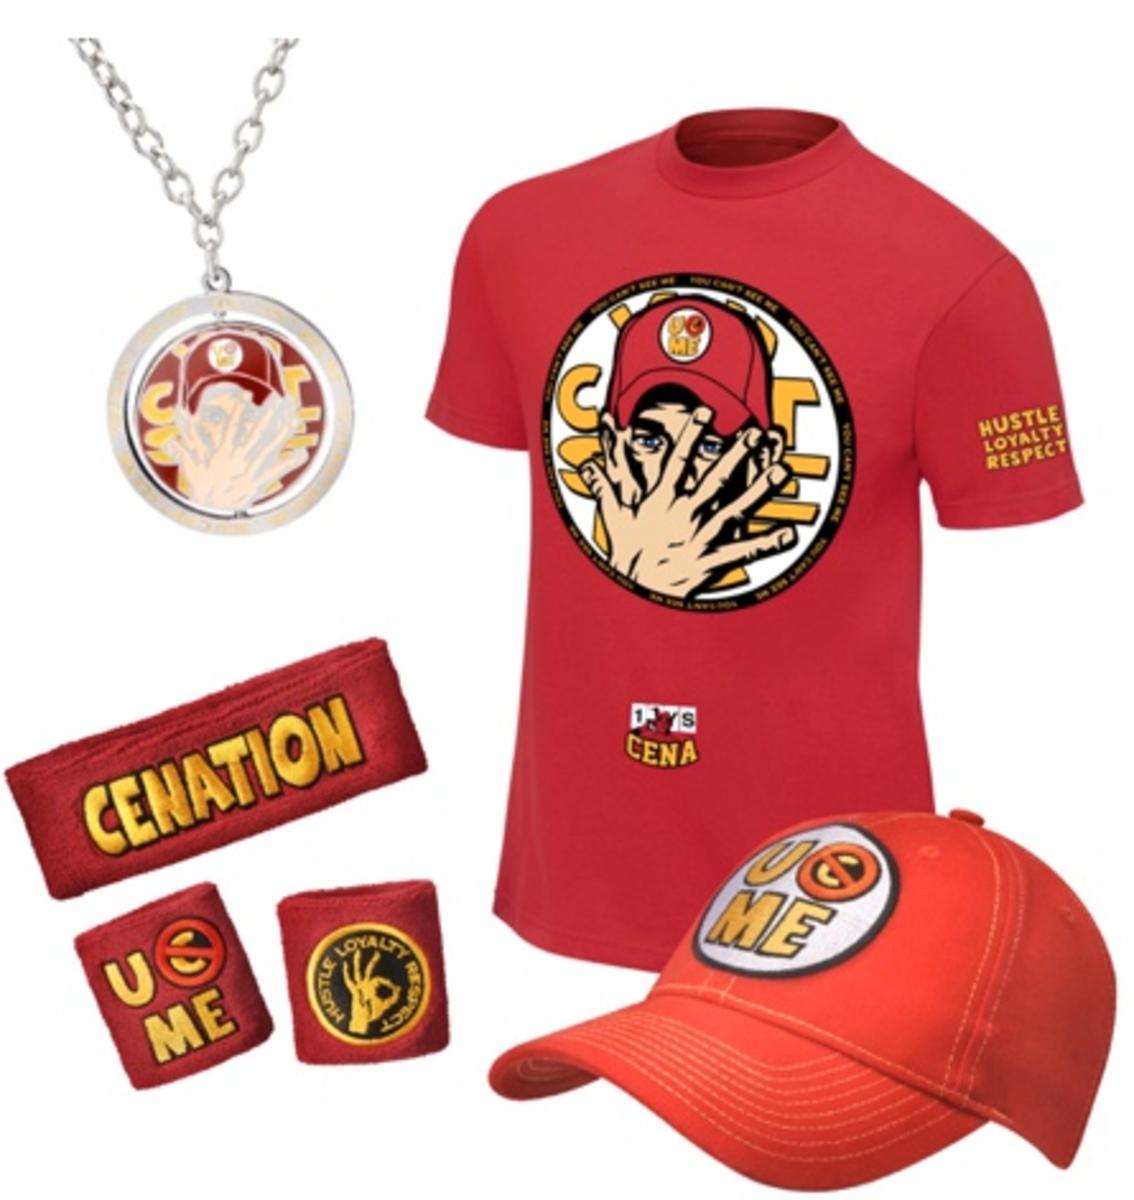 John Cena Merchandise